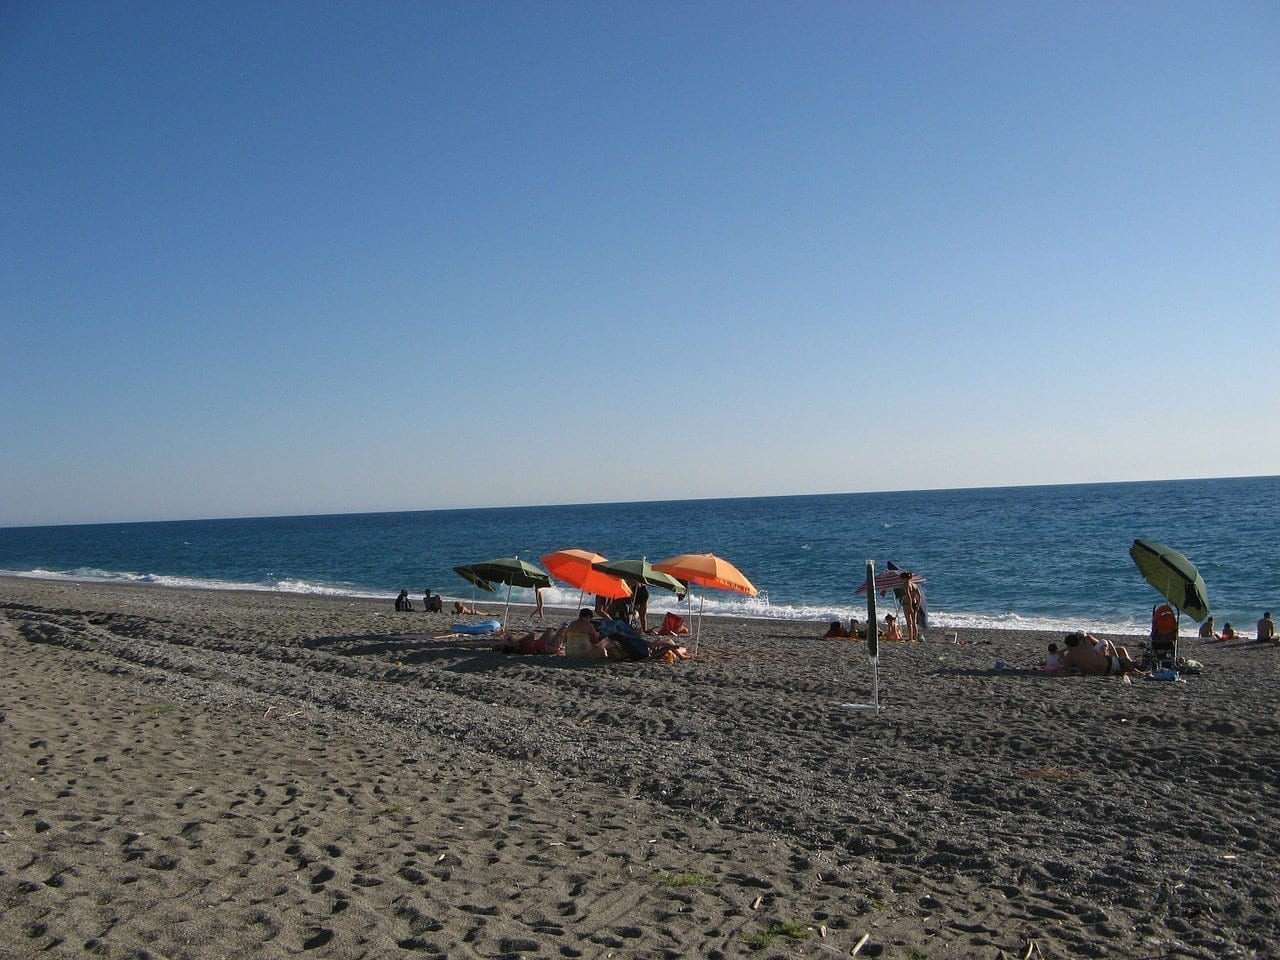 Calabria Belmonte Calabro Playa Portugal